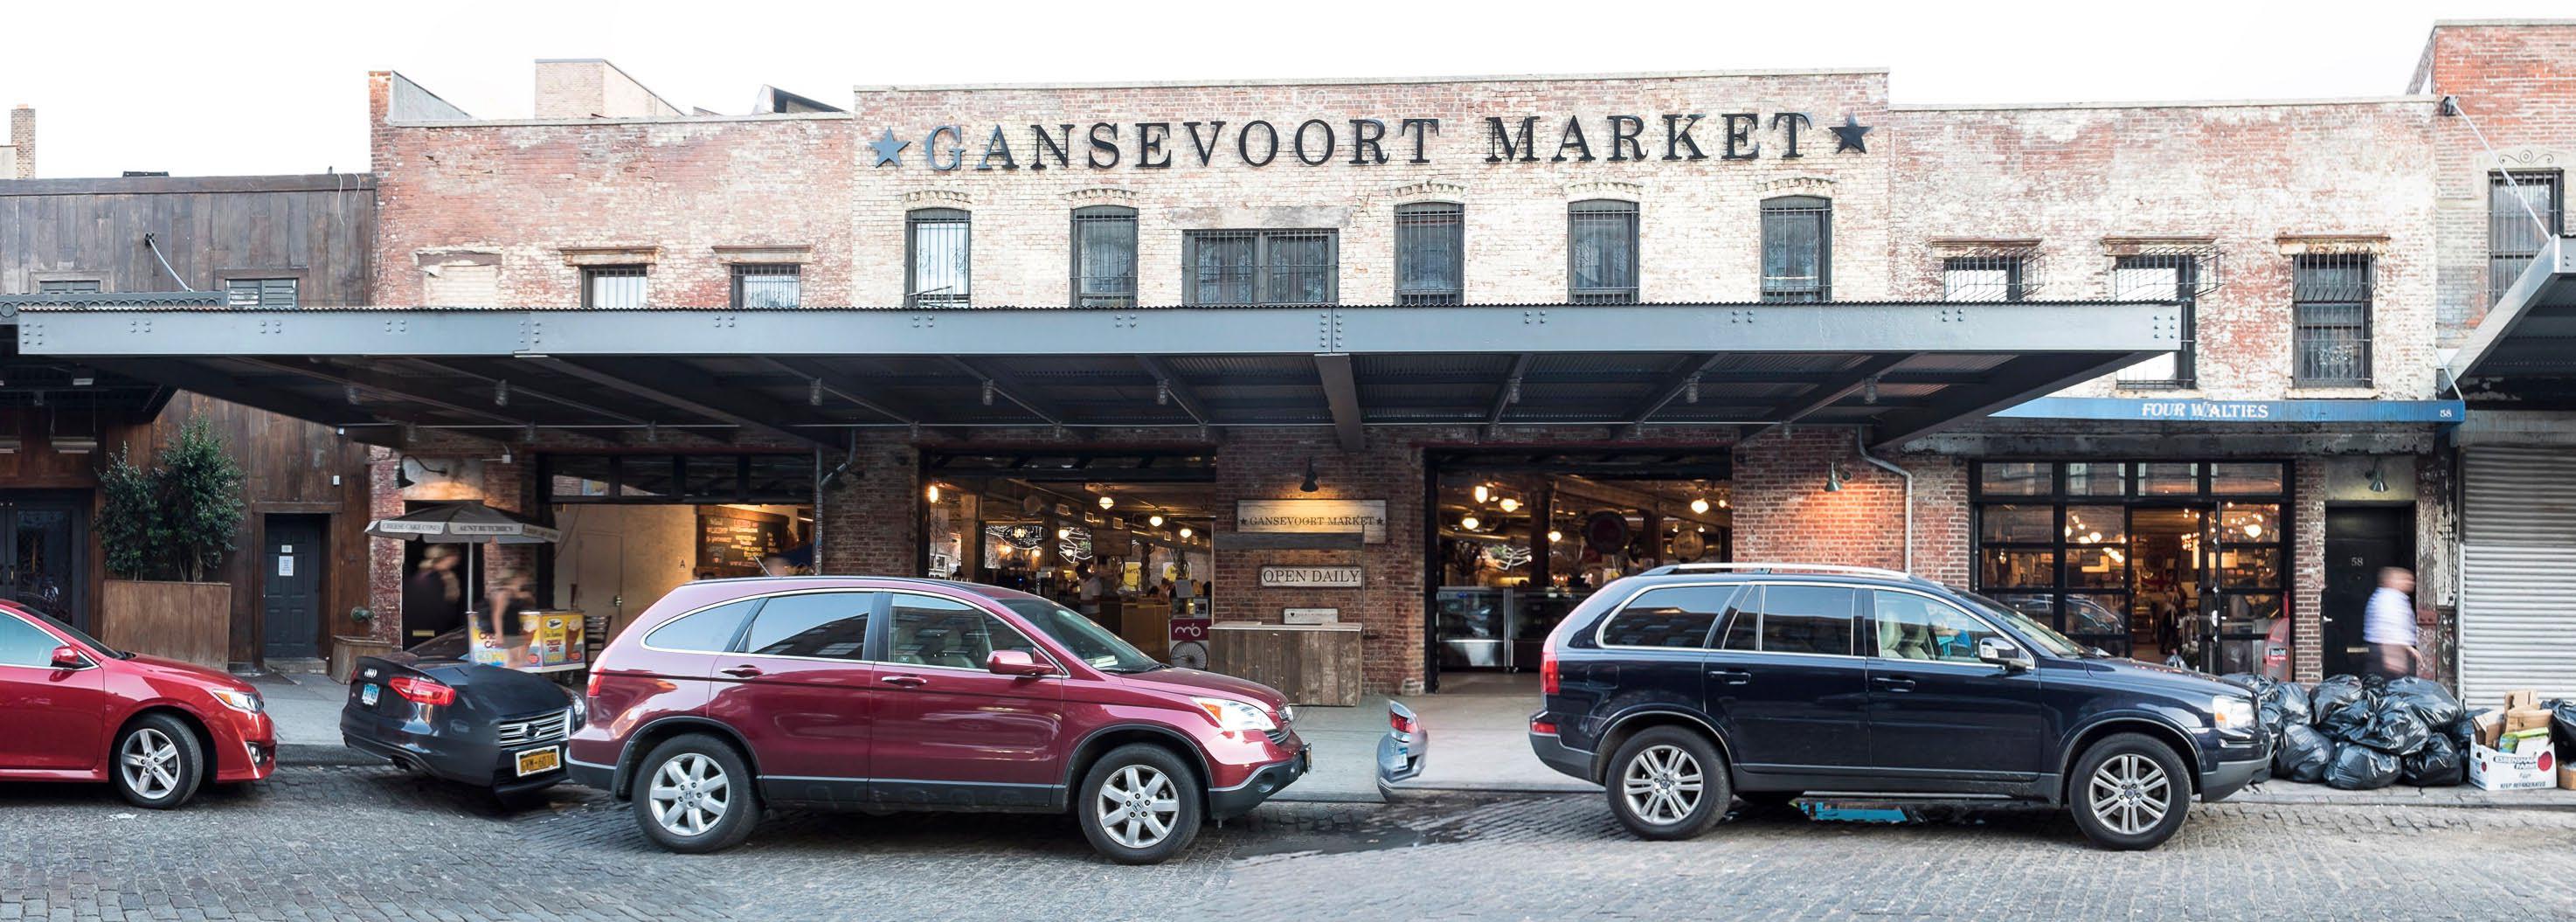 52-58 Gansevoort Street, existing condition